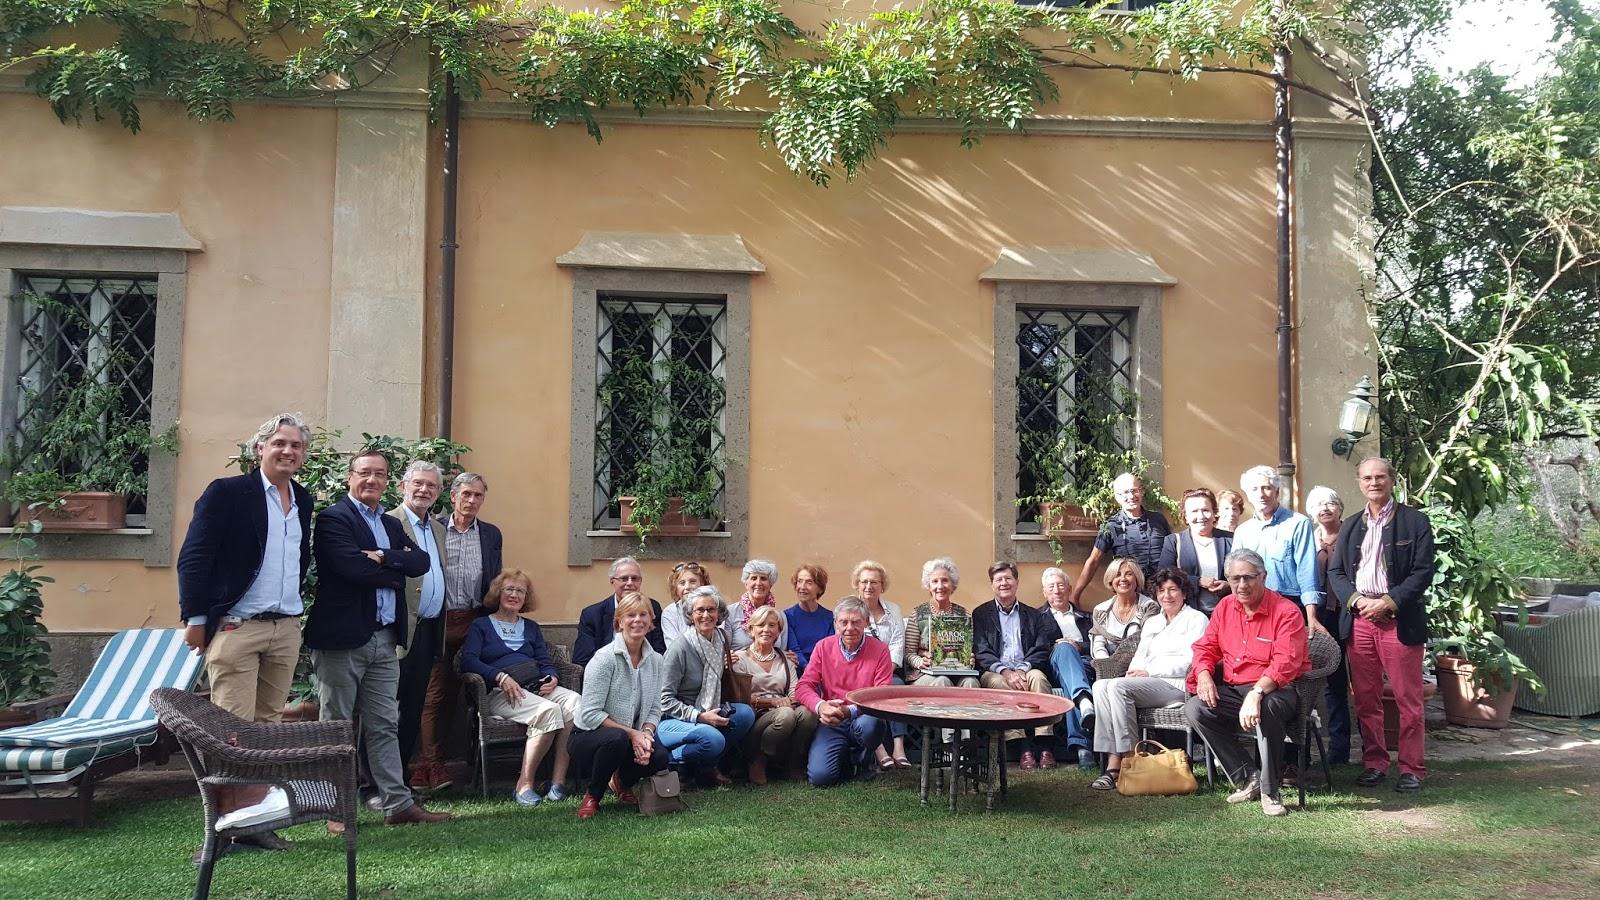 Hortibus voyage vmf 33 villas et jardins de toscane for Jardin de toscane